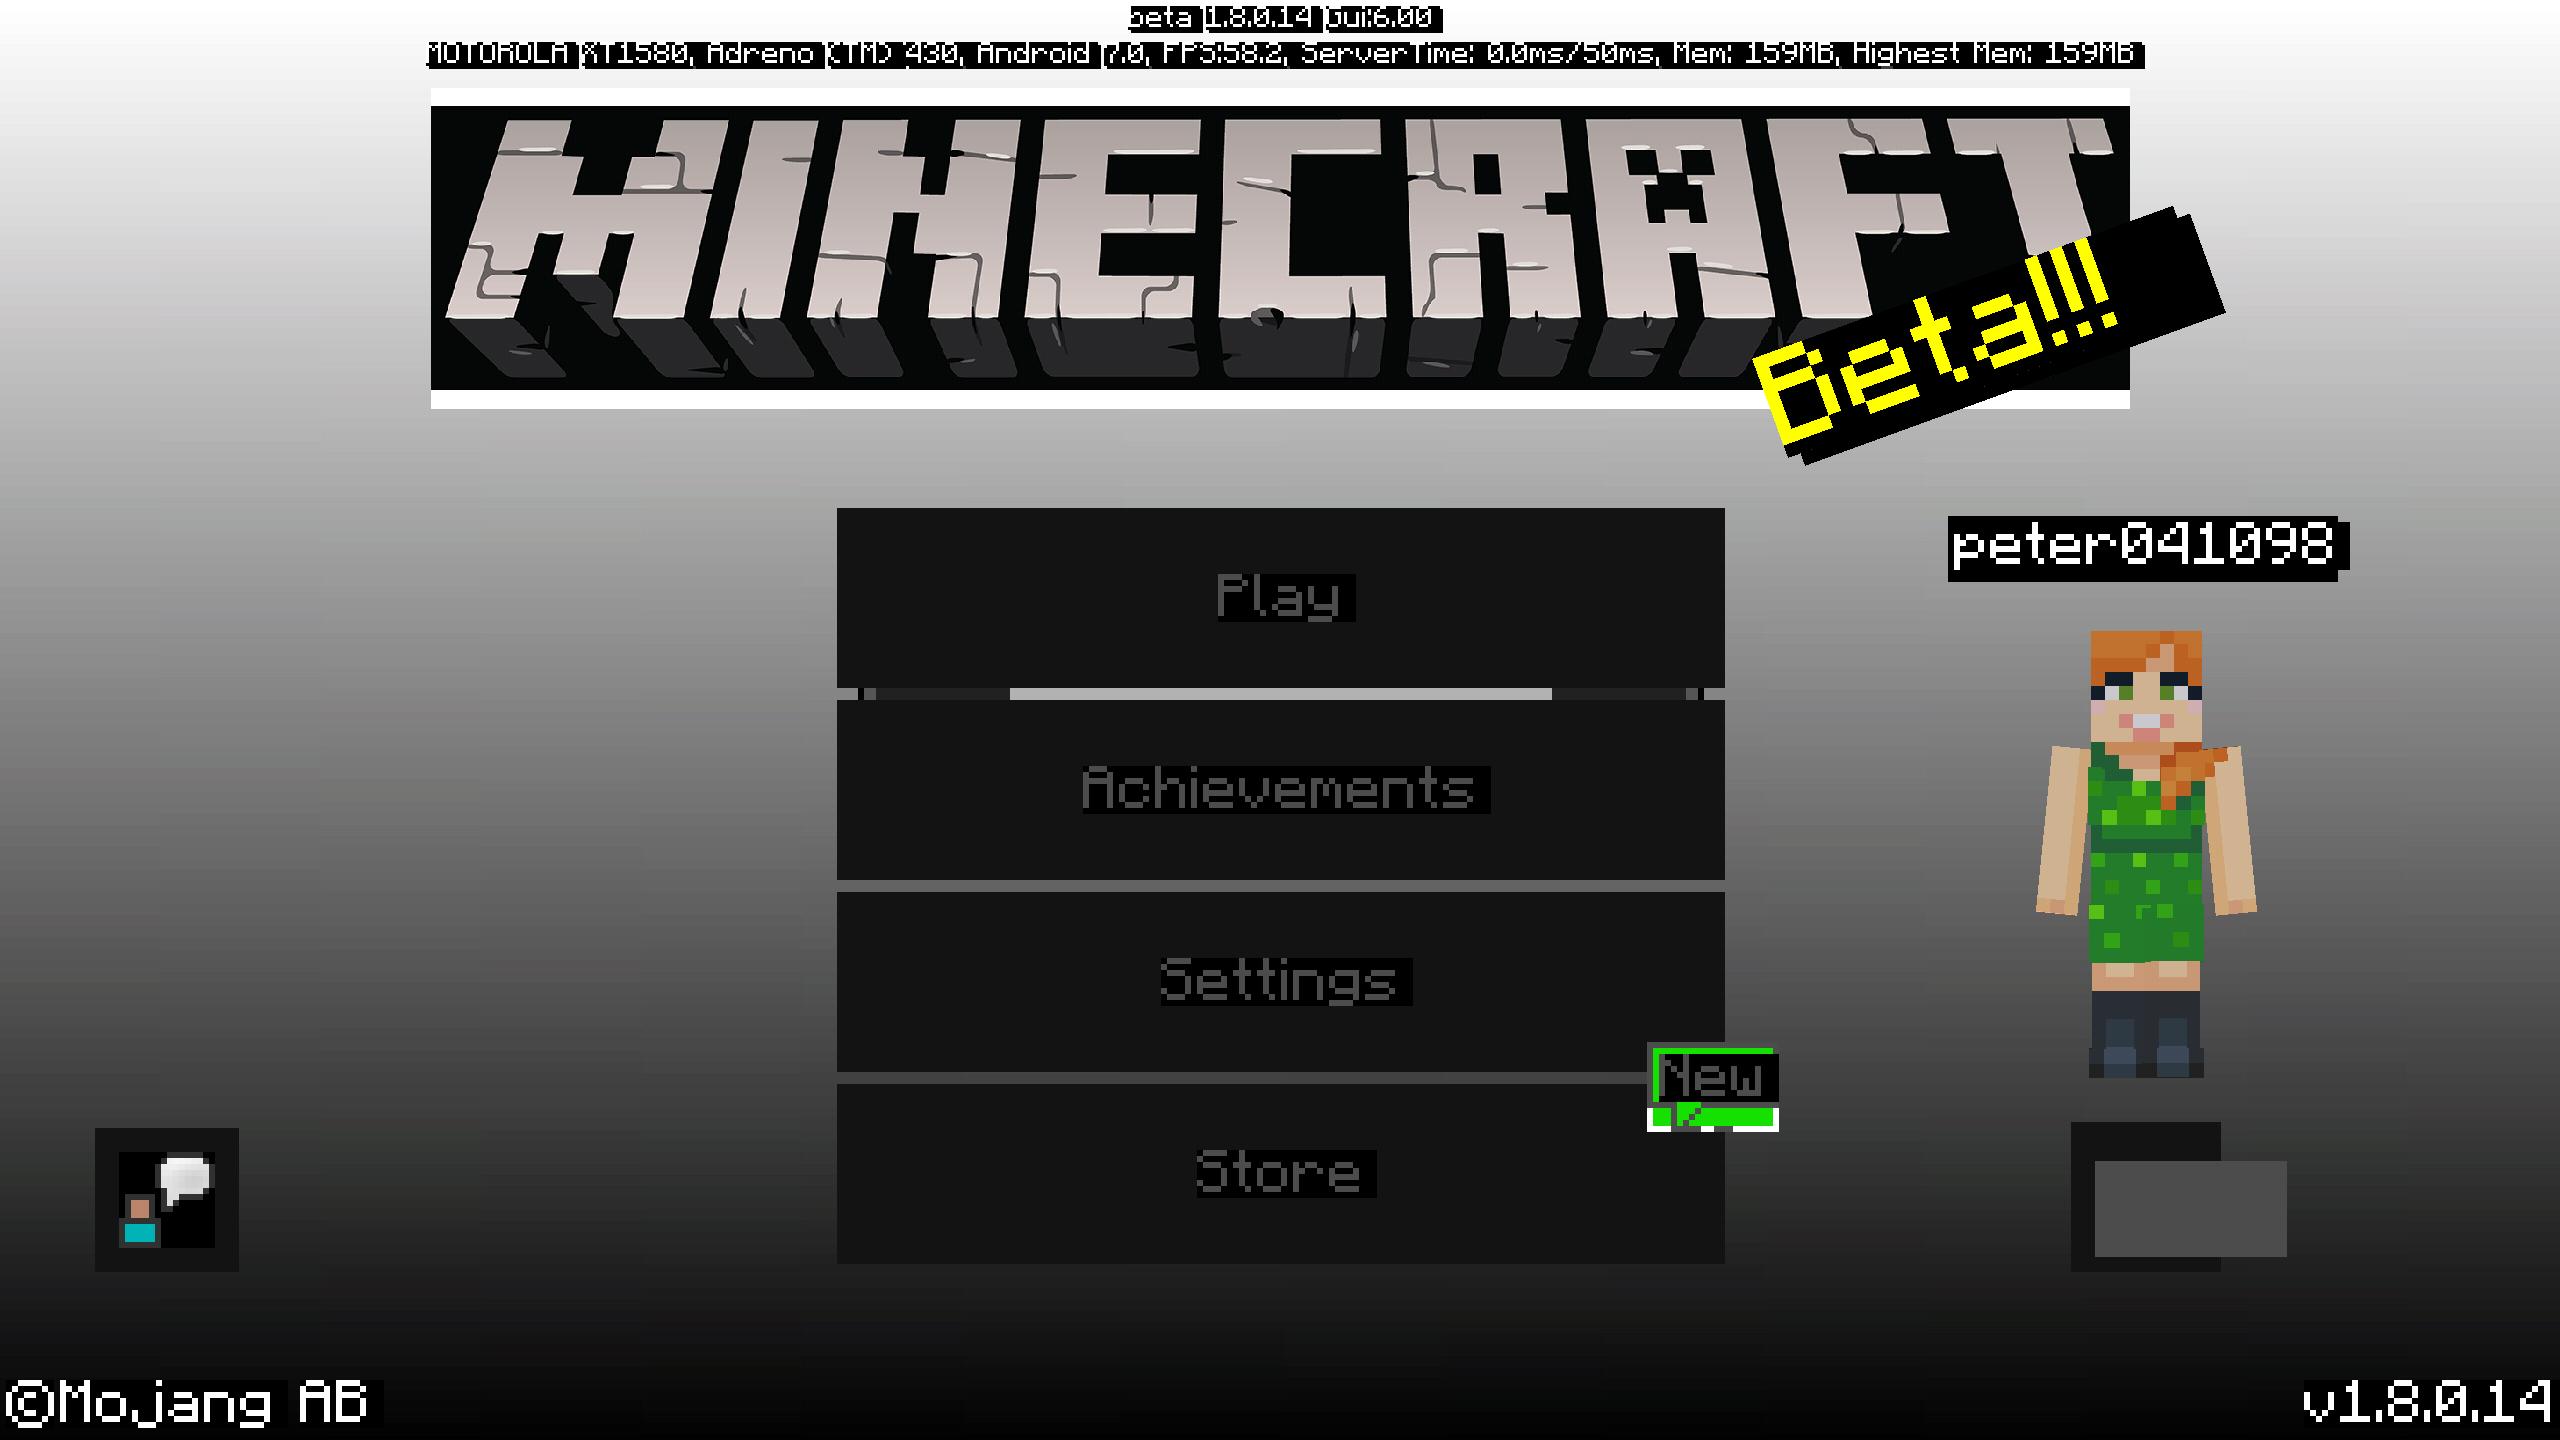 MCPE-39031] Main menu glitch - the home screen has black